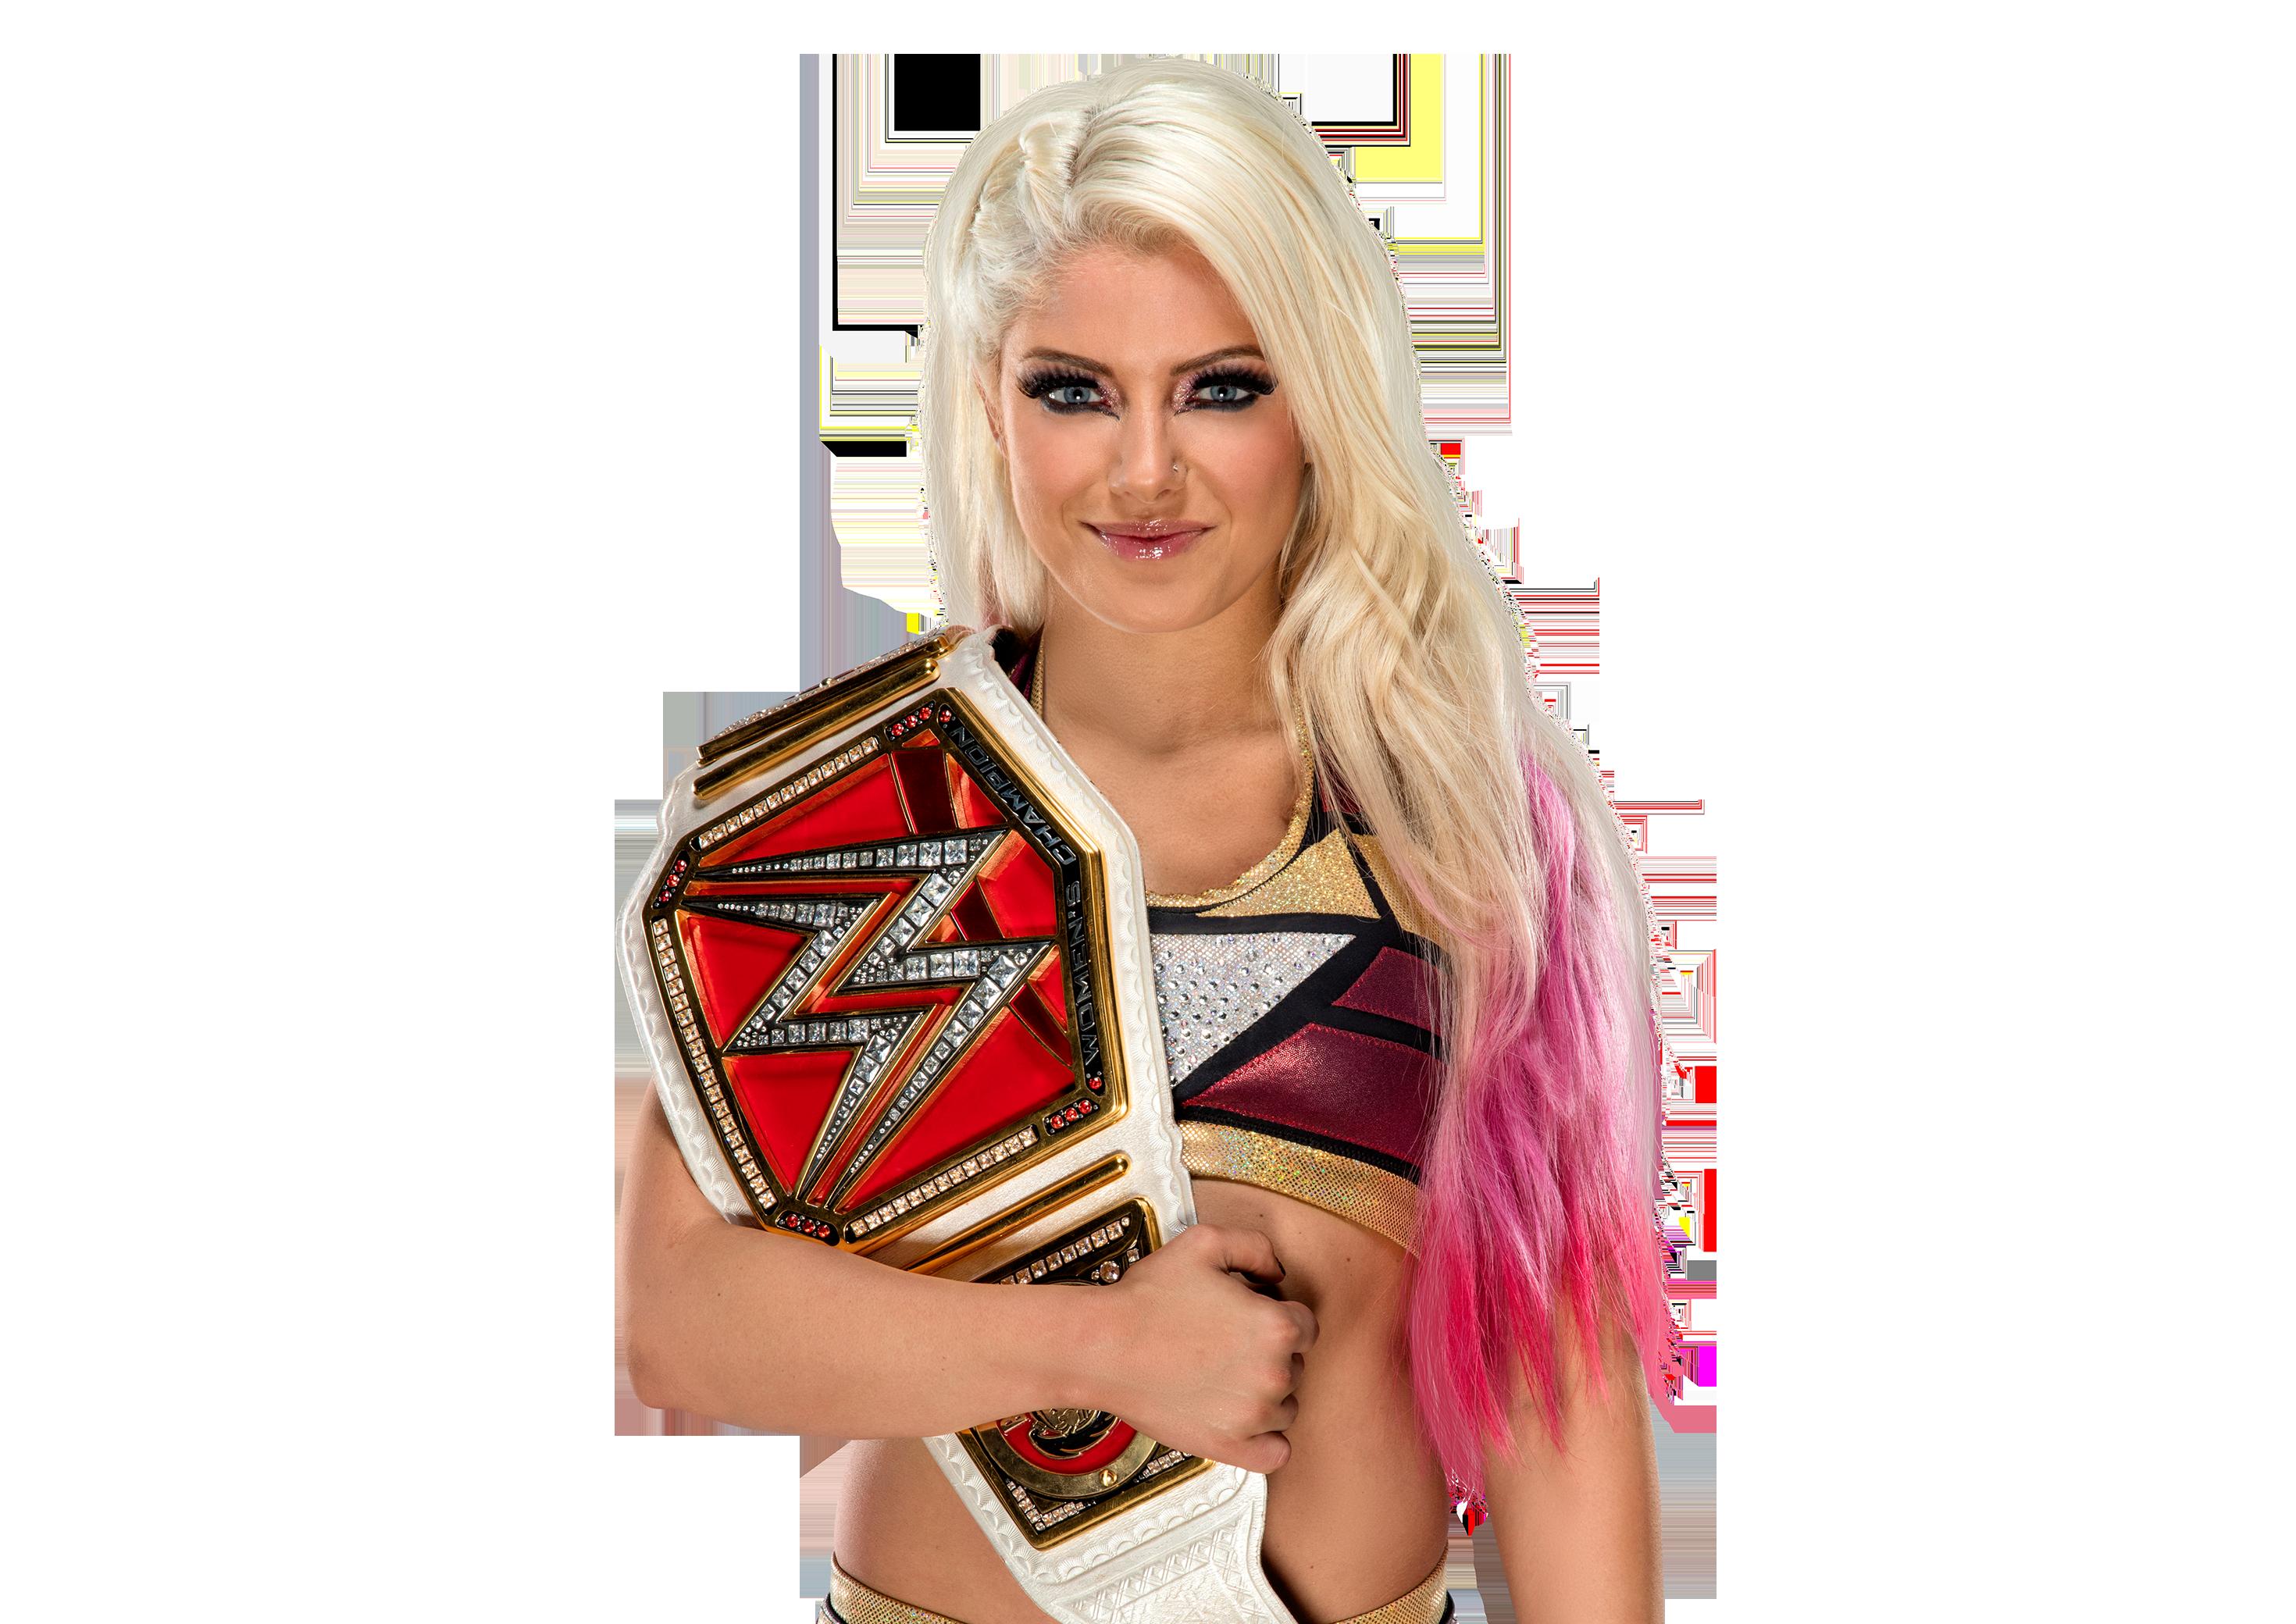 Alexa Bliss Alexa Wwe Raw Women Raw Women S Champion